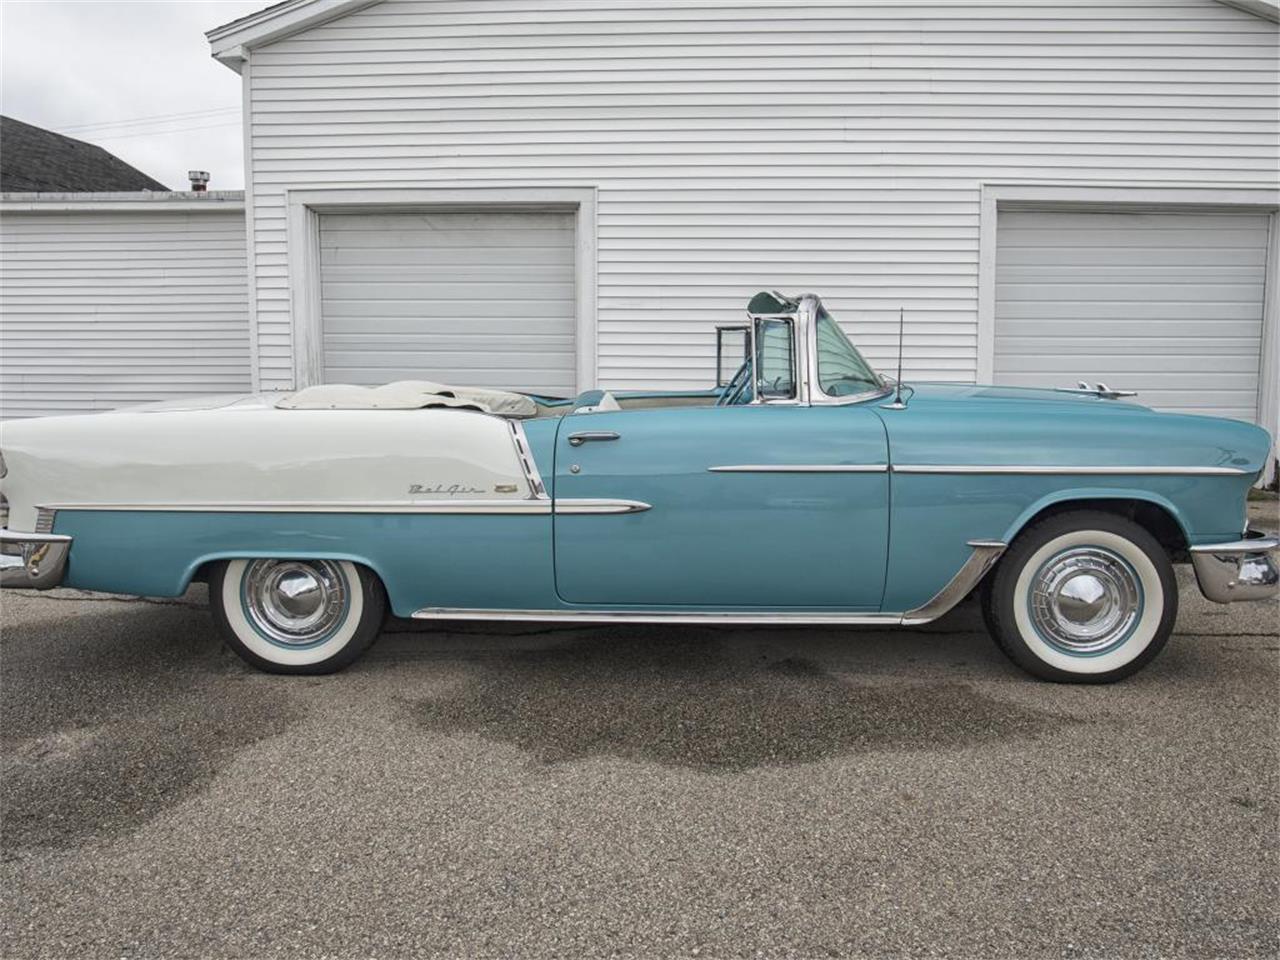 1955 Chevrolet Bel Air For Sale Classiccars Com Cc 999965